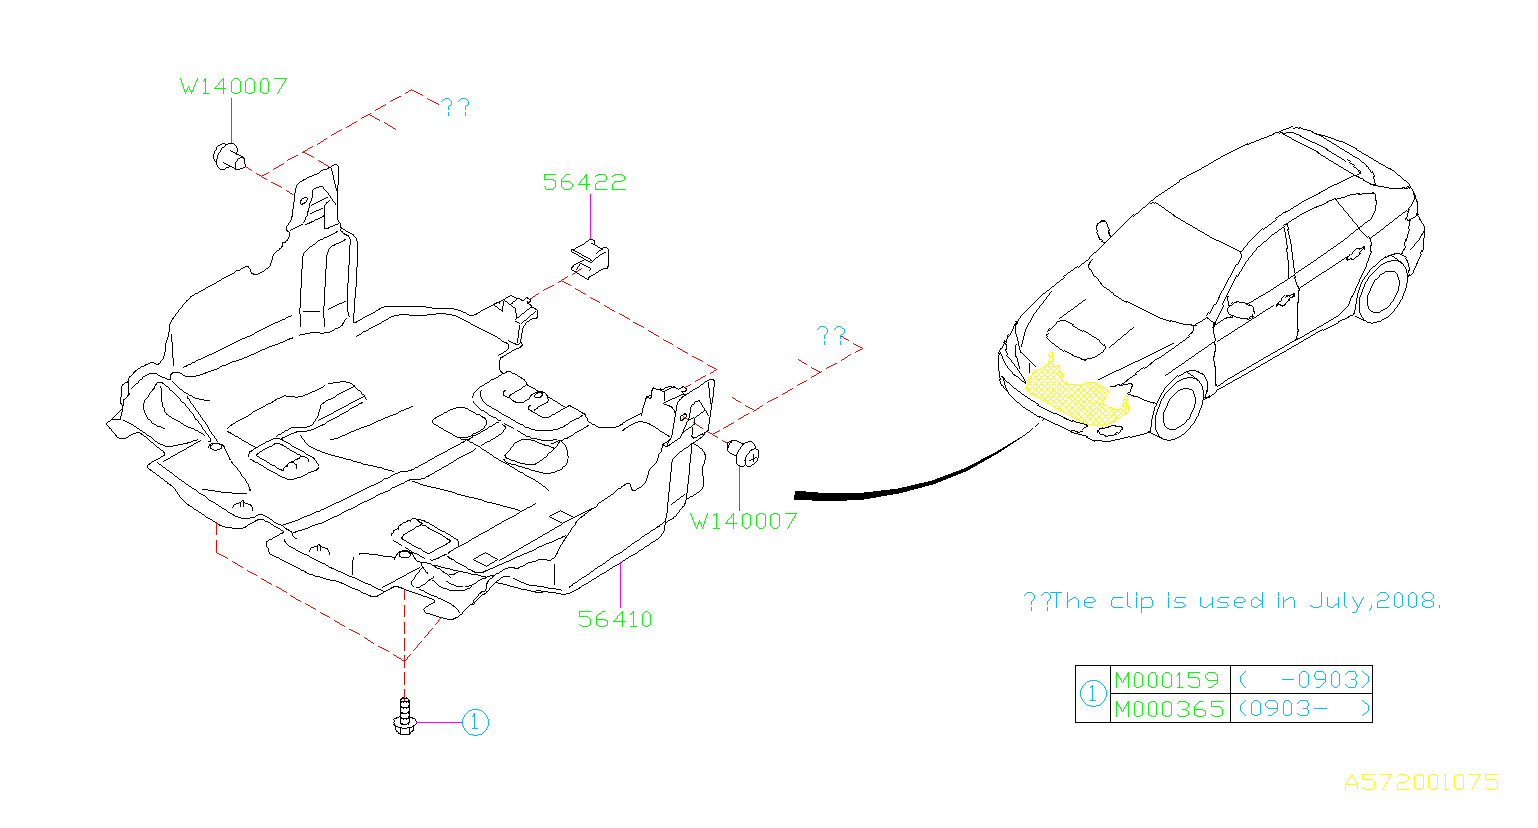 Subaru Sambar Wiring Diagram - All Diagram Schematics on